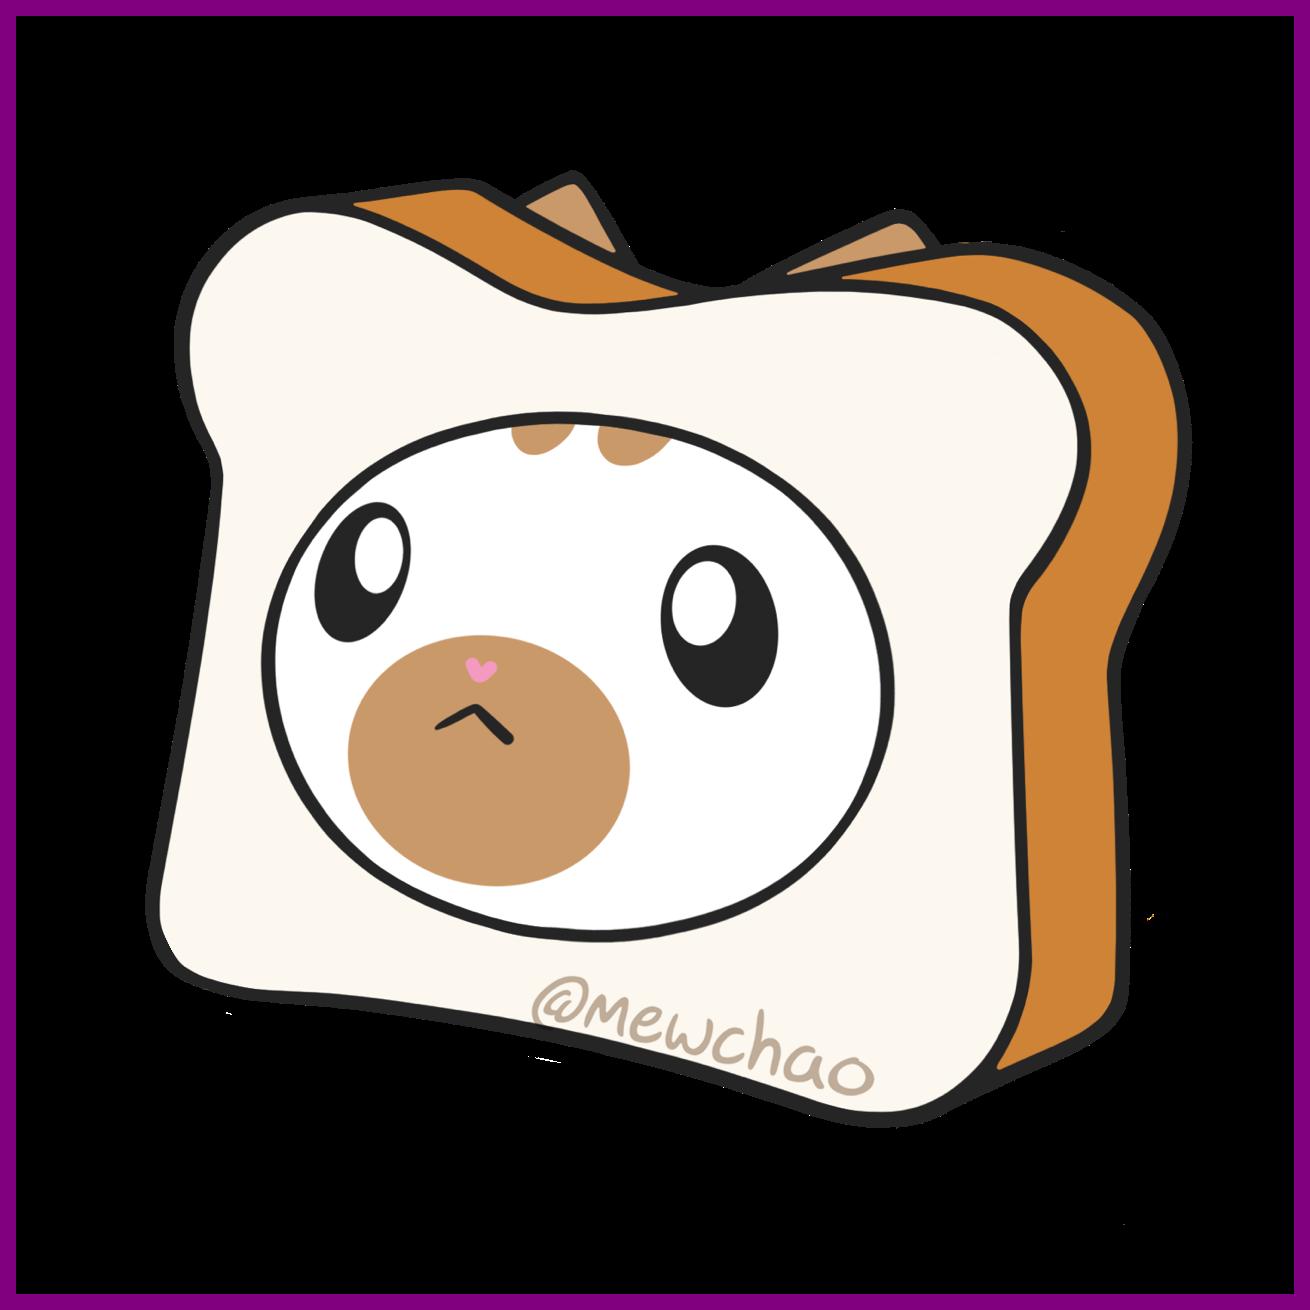 Marvelous webkinz ganz tumblr. Hamster clipart face